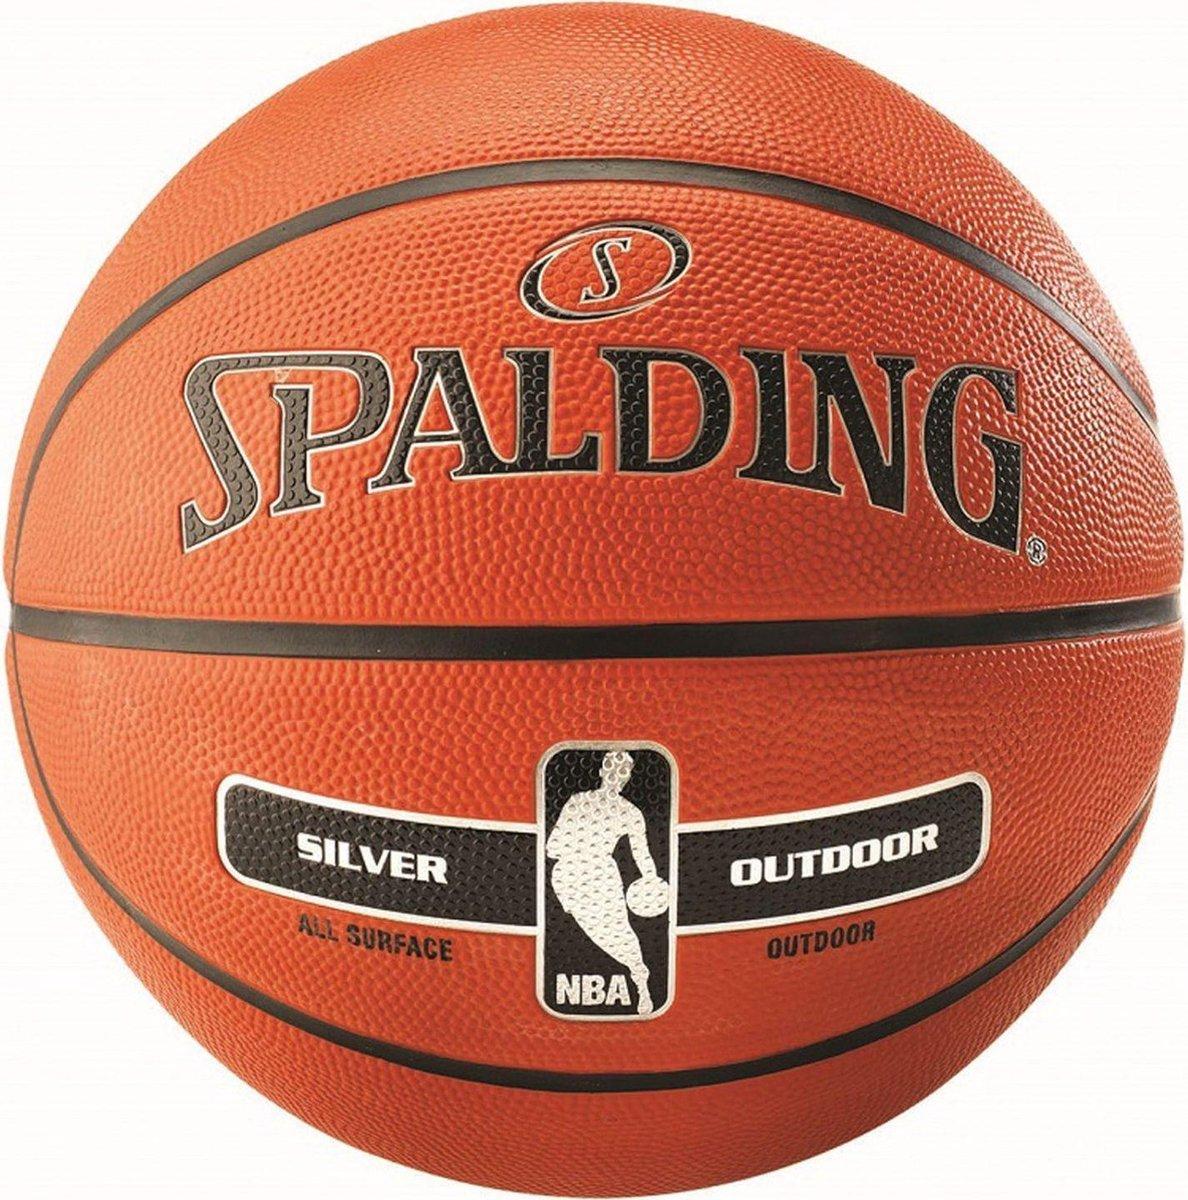 Spalding basketbal NBA Silver series rubber maat 7